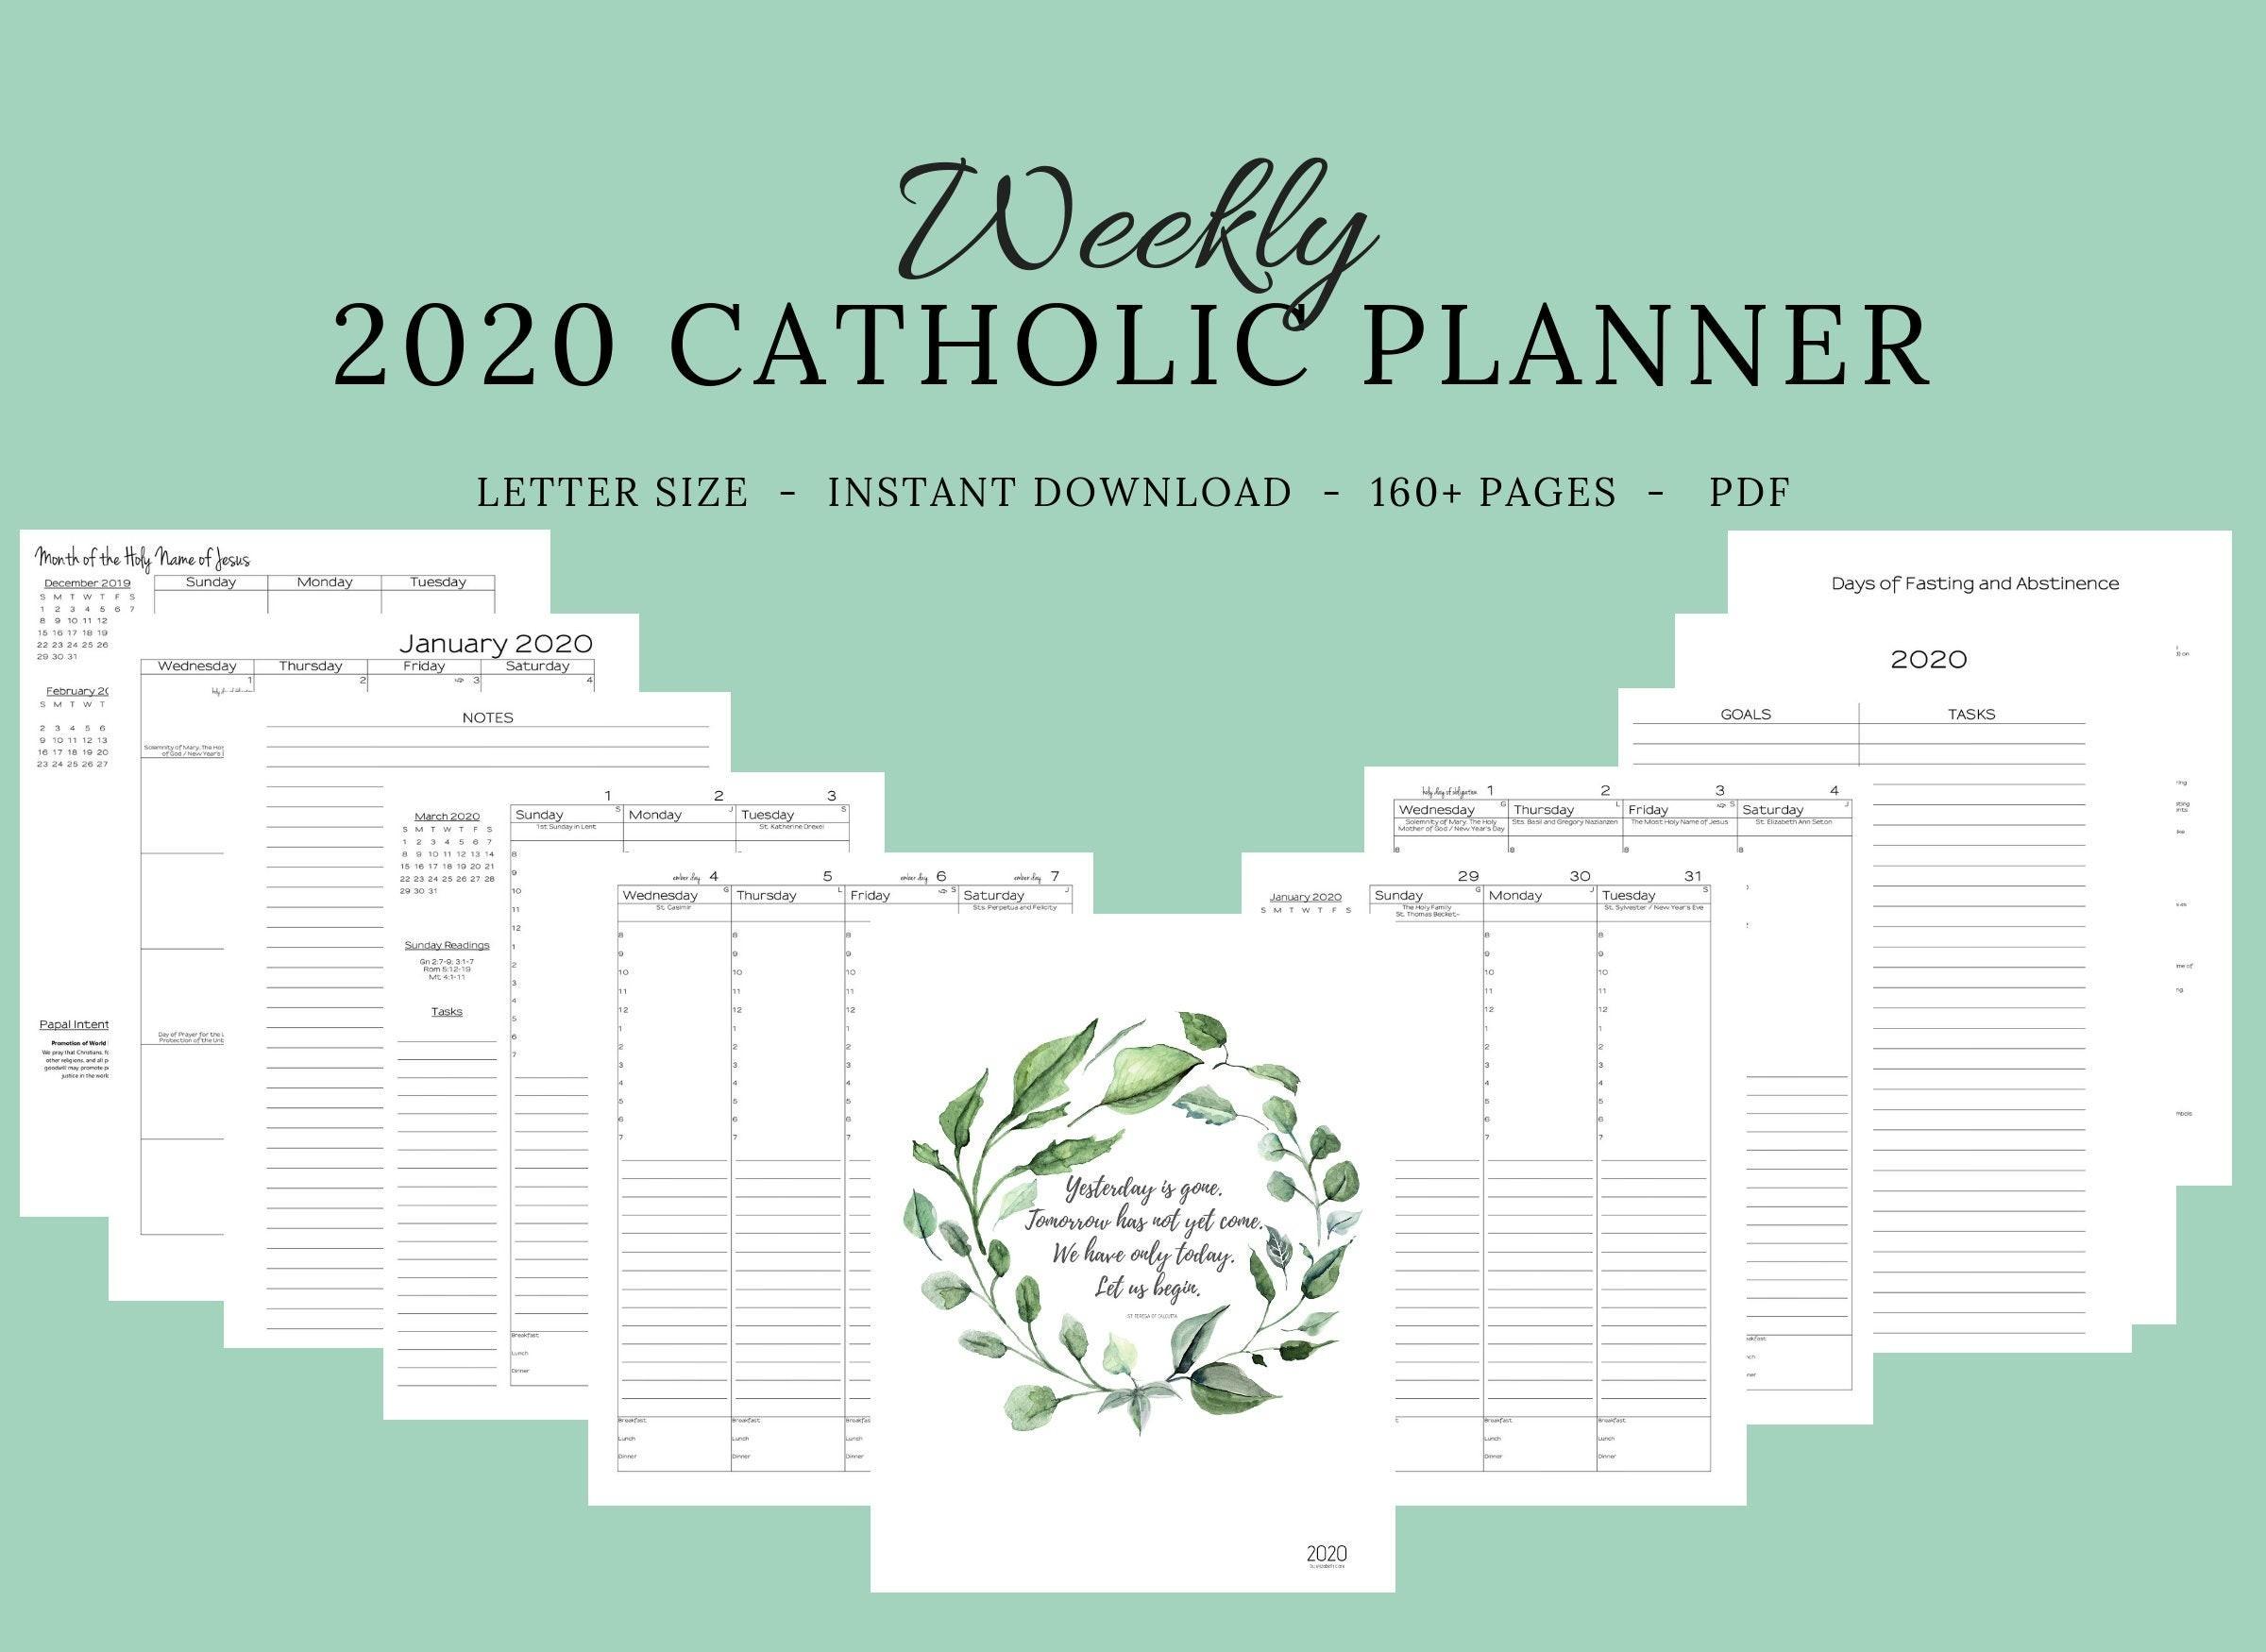 2020 Catholic Planner Weekly Printable: Daily Planner / Weekly Calendar /  Catholic Liturgical Year Calendar / Printable Catholic Planner-2020 Catholic Monthly Calendar Printable